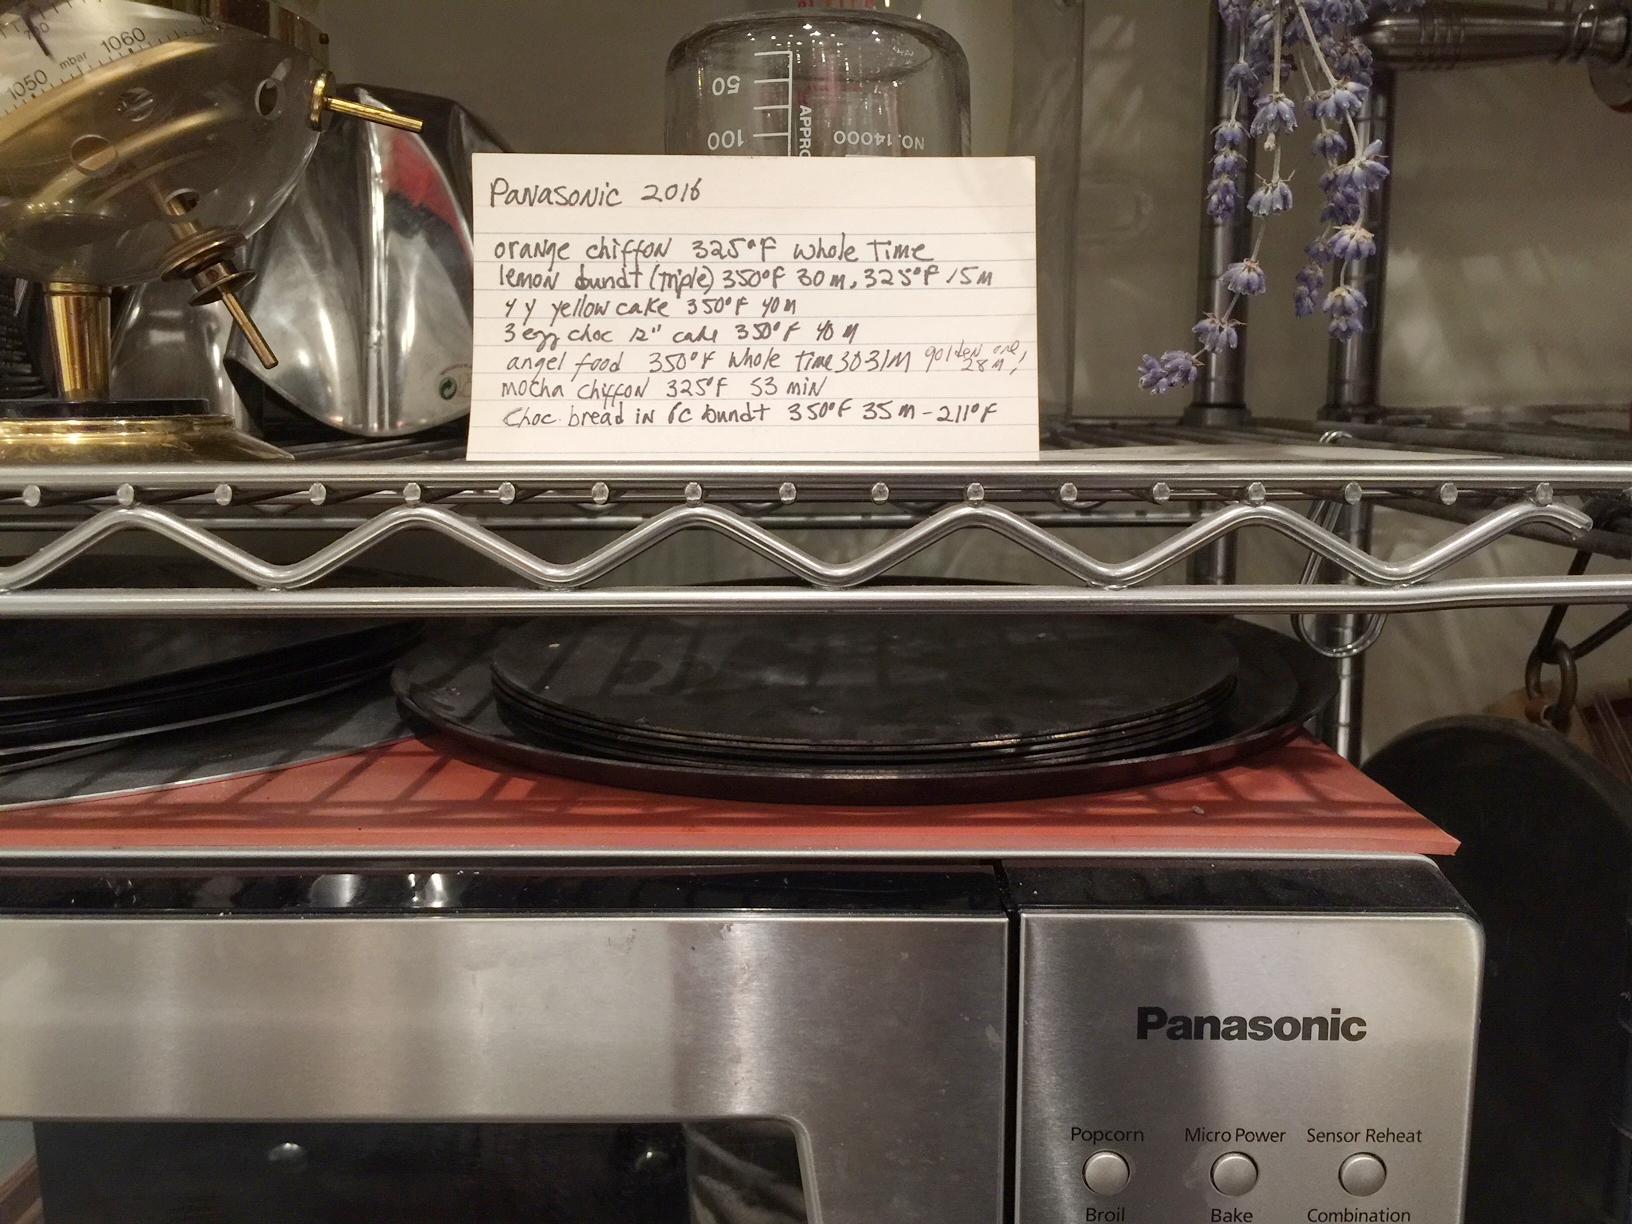 Pana oven card.JPG